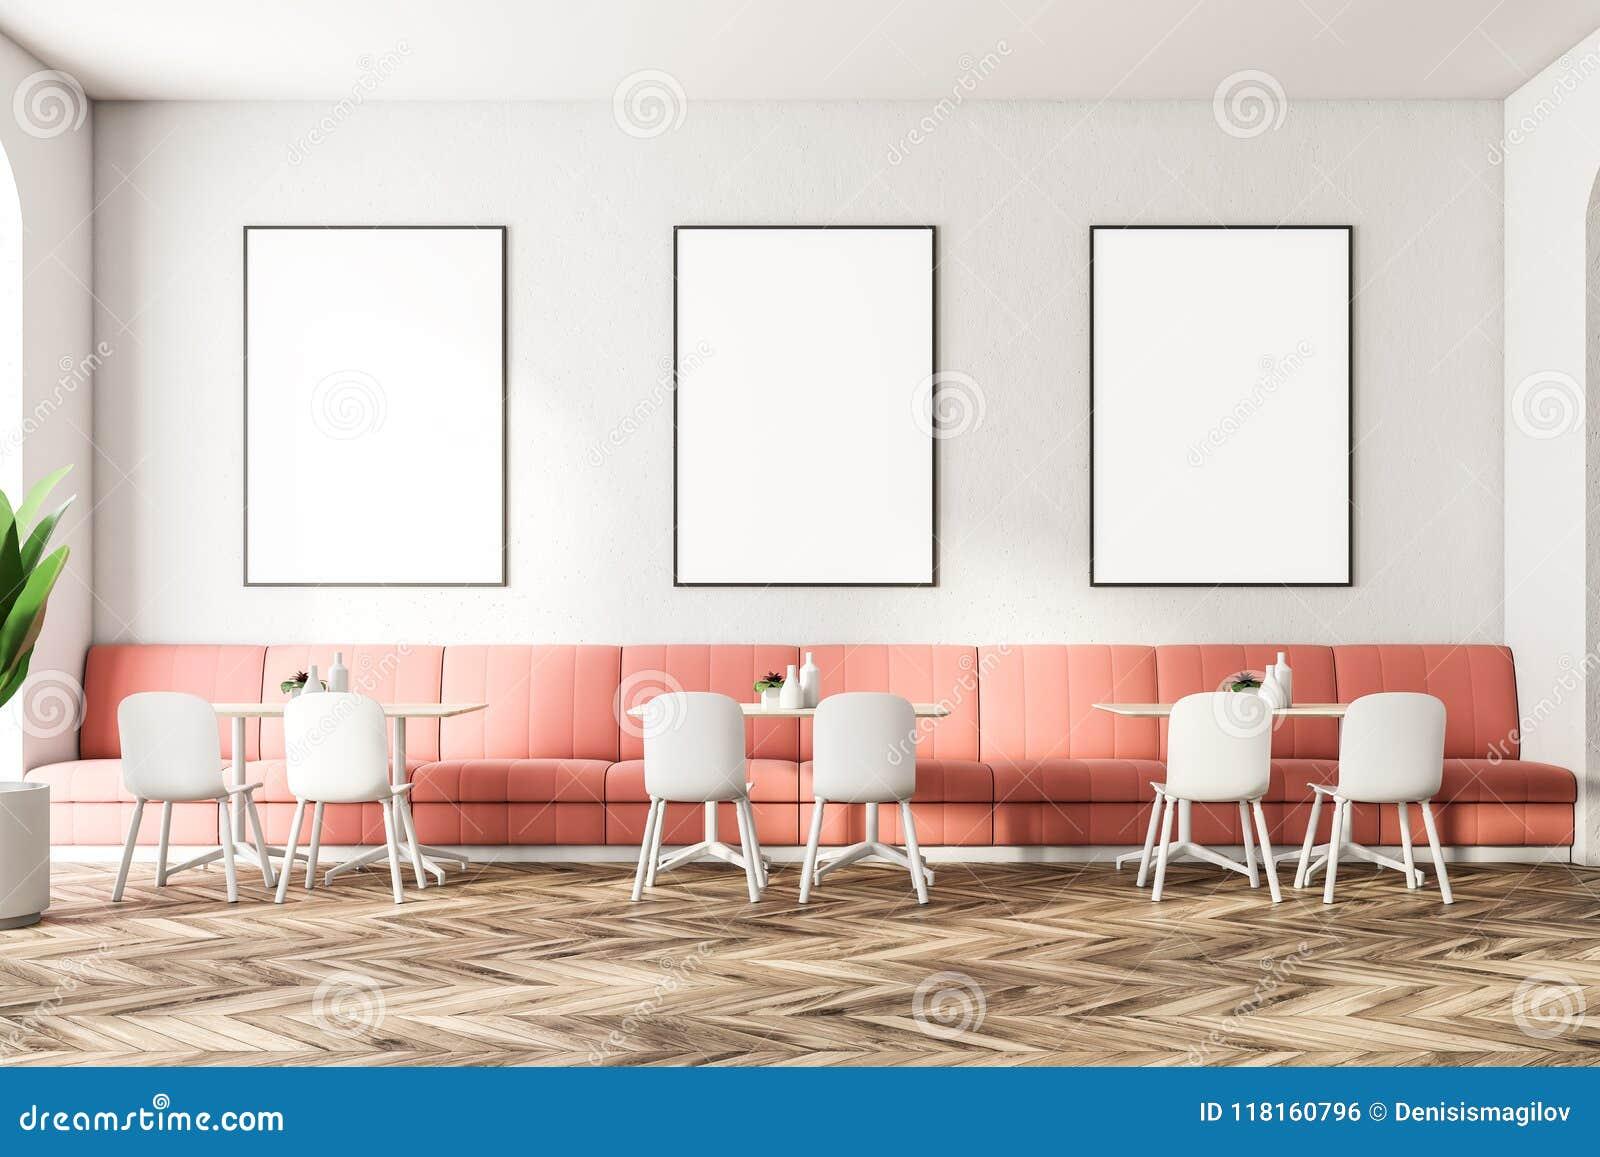 Pink Sofas Restaurant Interior Poster Gallery Stock Illustration Illustration Of Beautiful Background 118160796